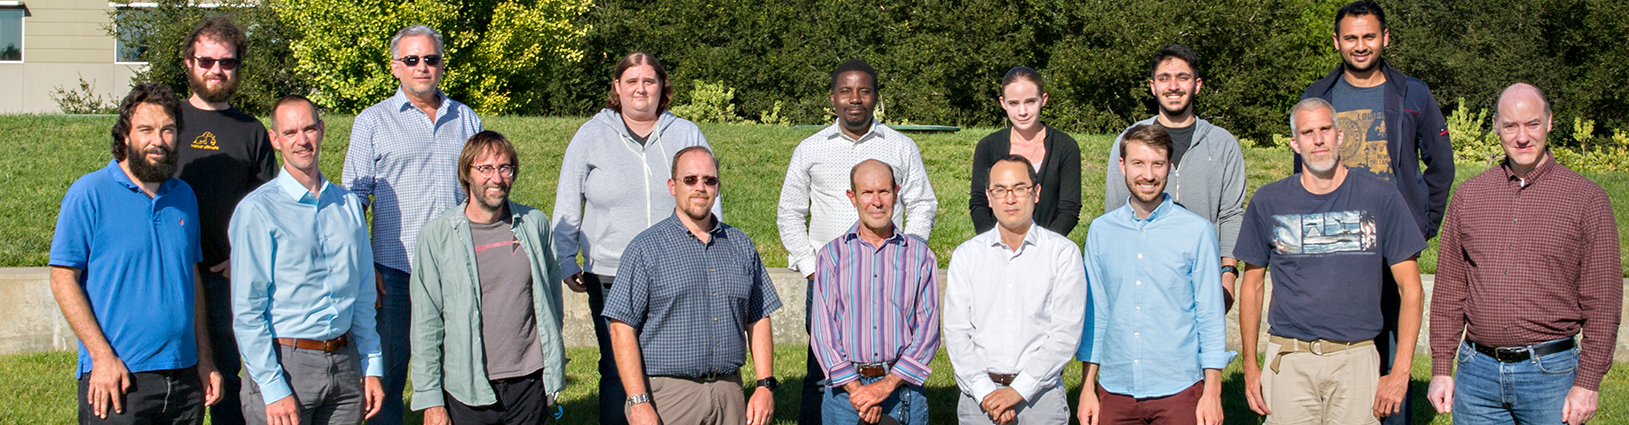 cognitive simulation team photo